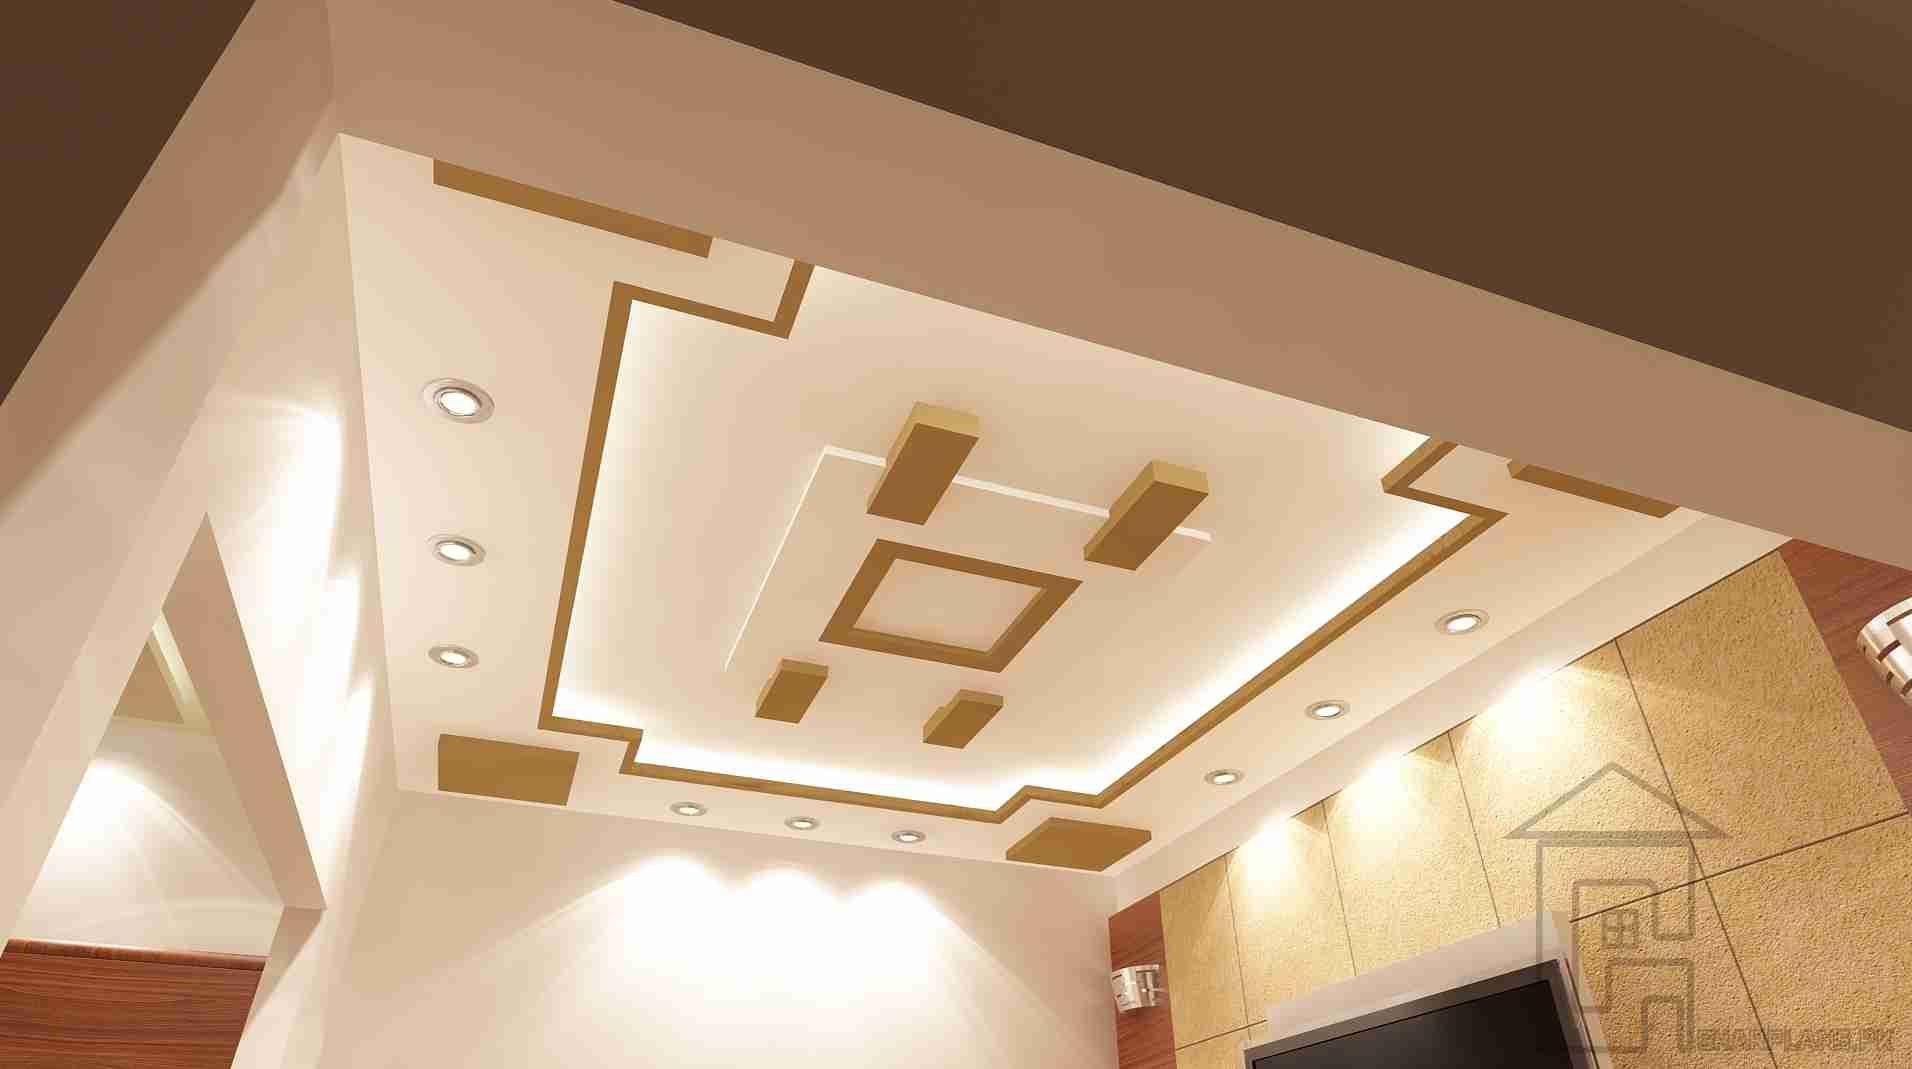 Fall Ceiling Design | Gharplans.pk | Ceiling design ...